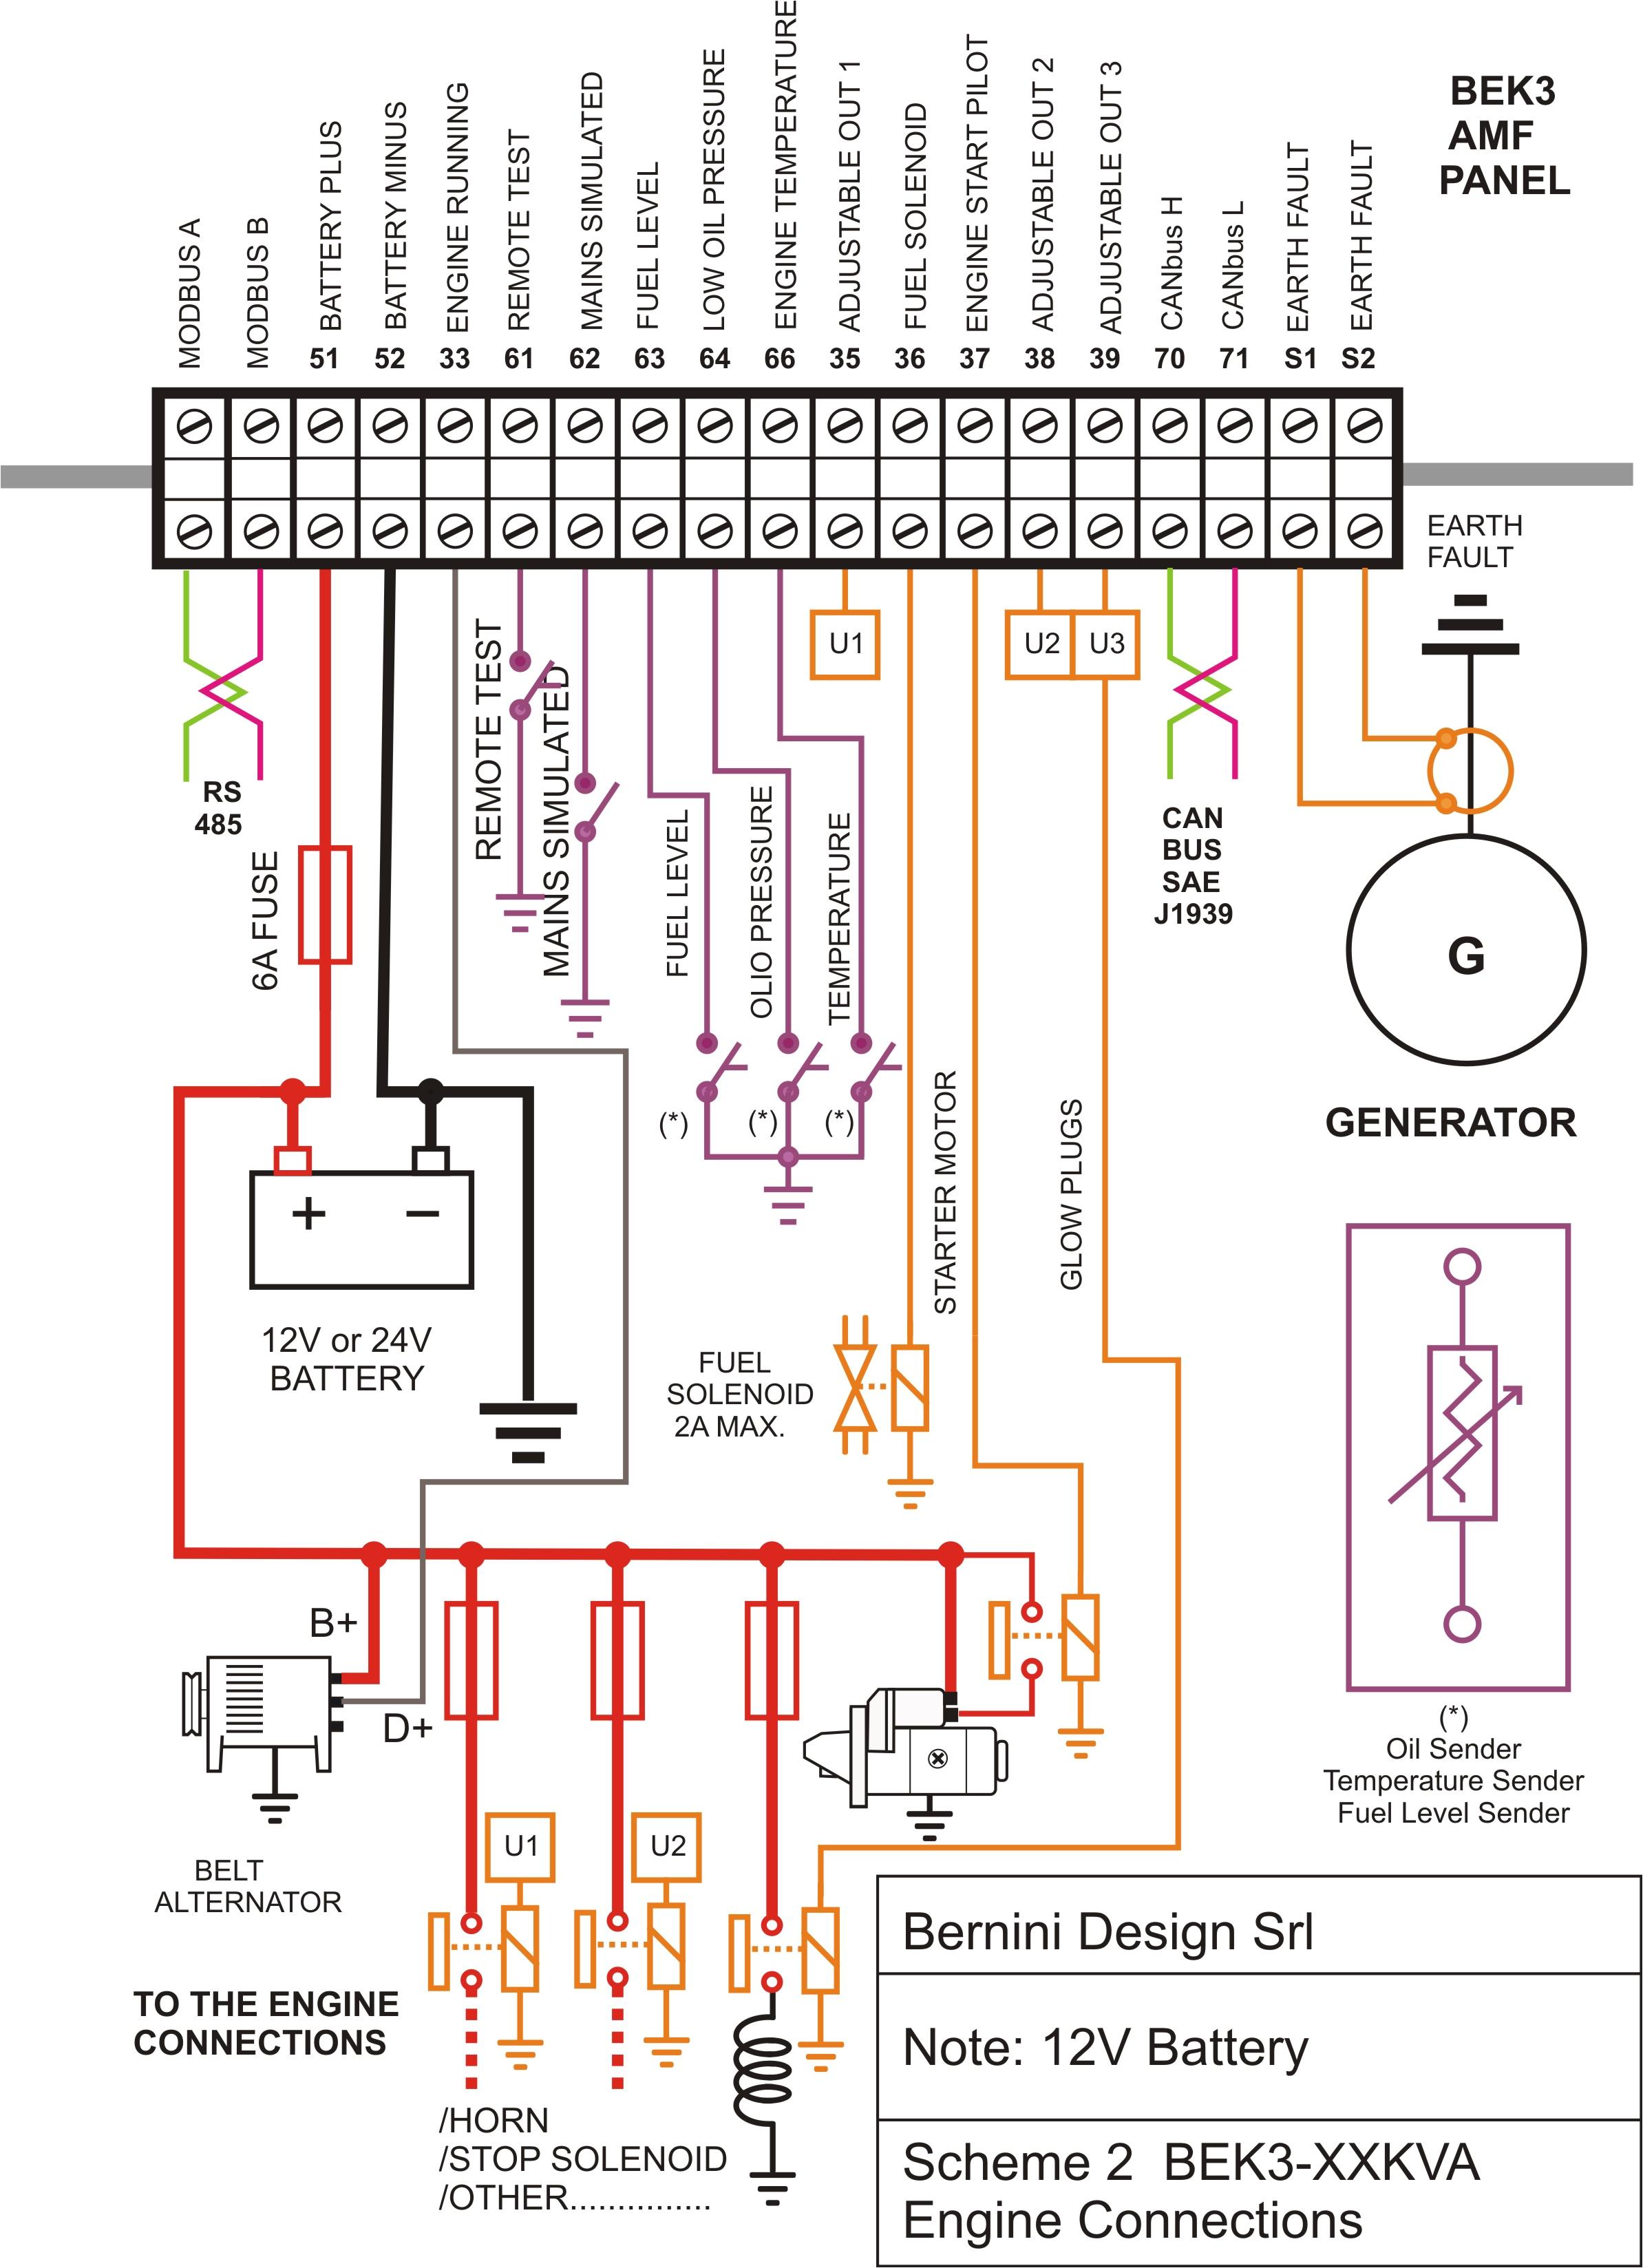 wiring diagram genset perkins wiring diagram hostgenerator electrical diagram wiring diagram datasource wiring diagram genset perkins